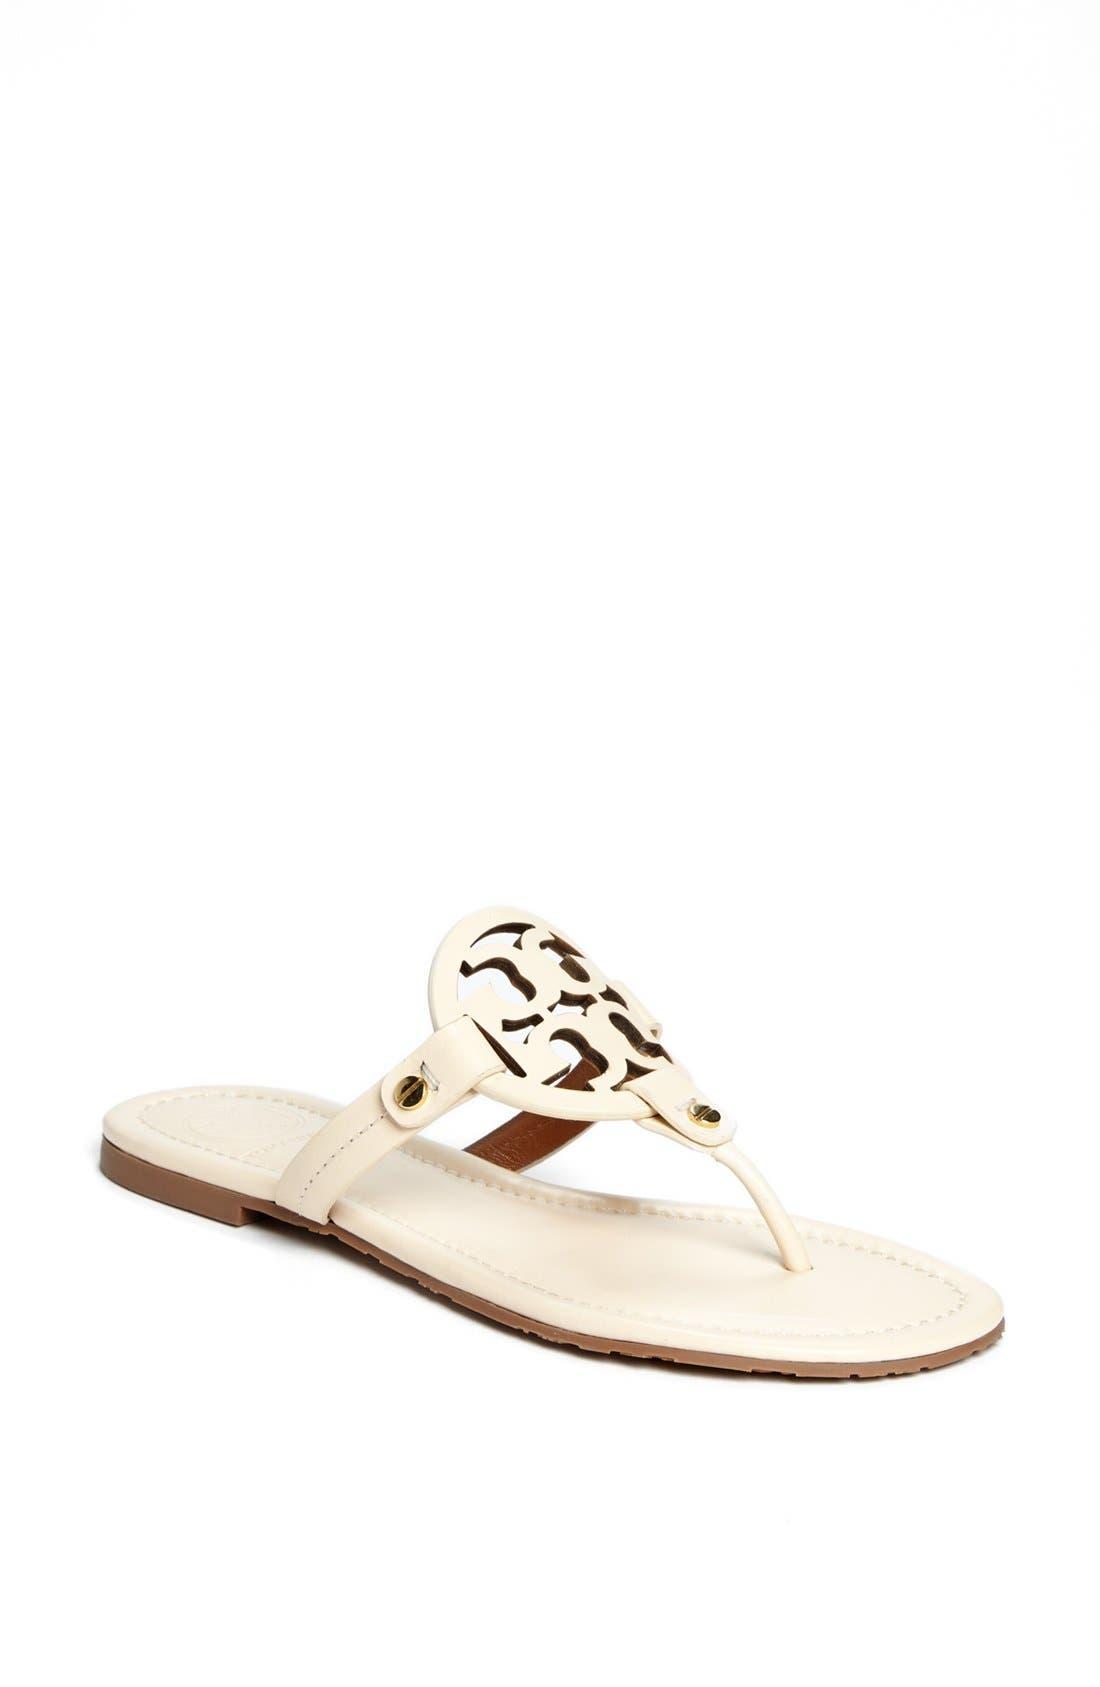 Main Image - Tory Burch 'Miller' Thong Sandal